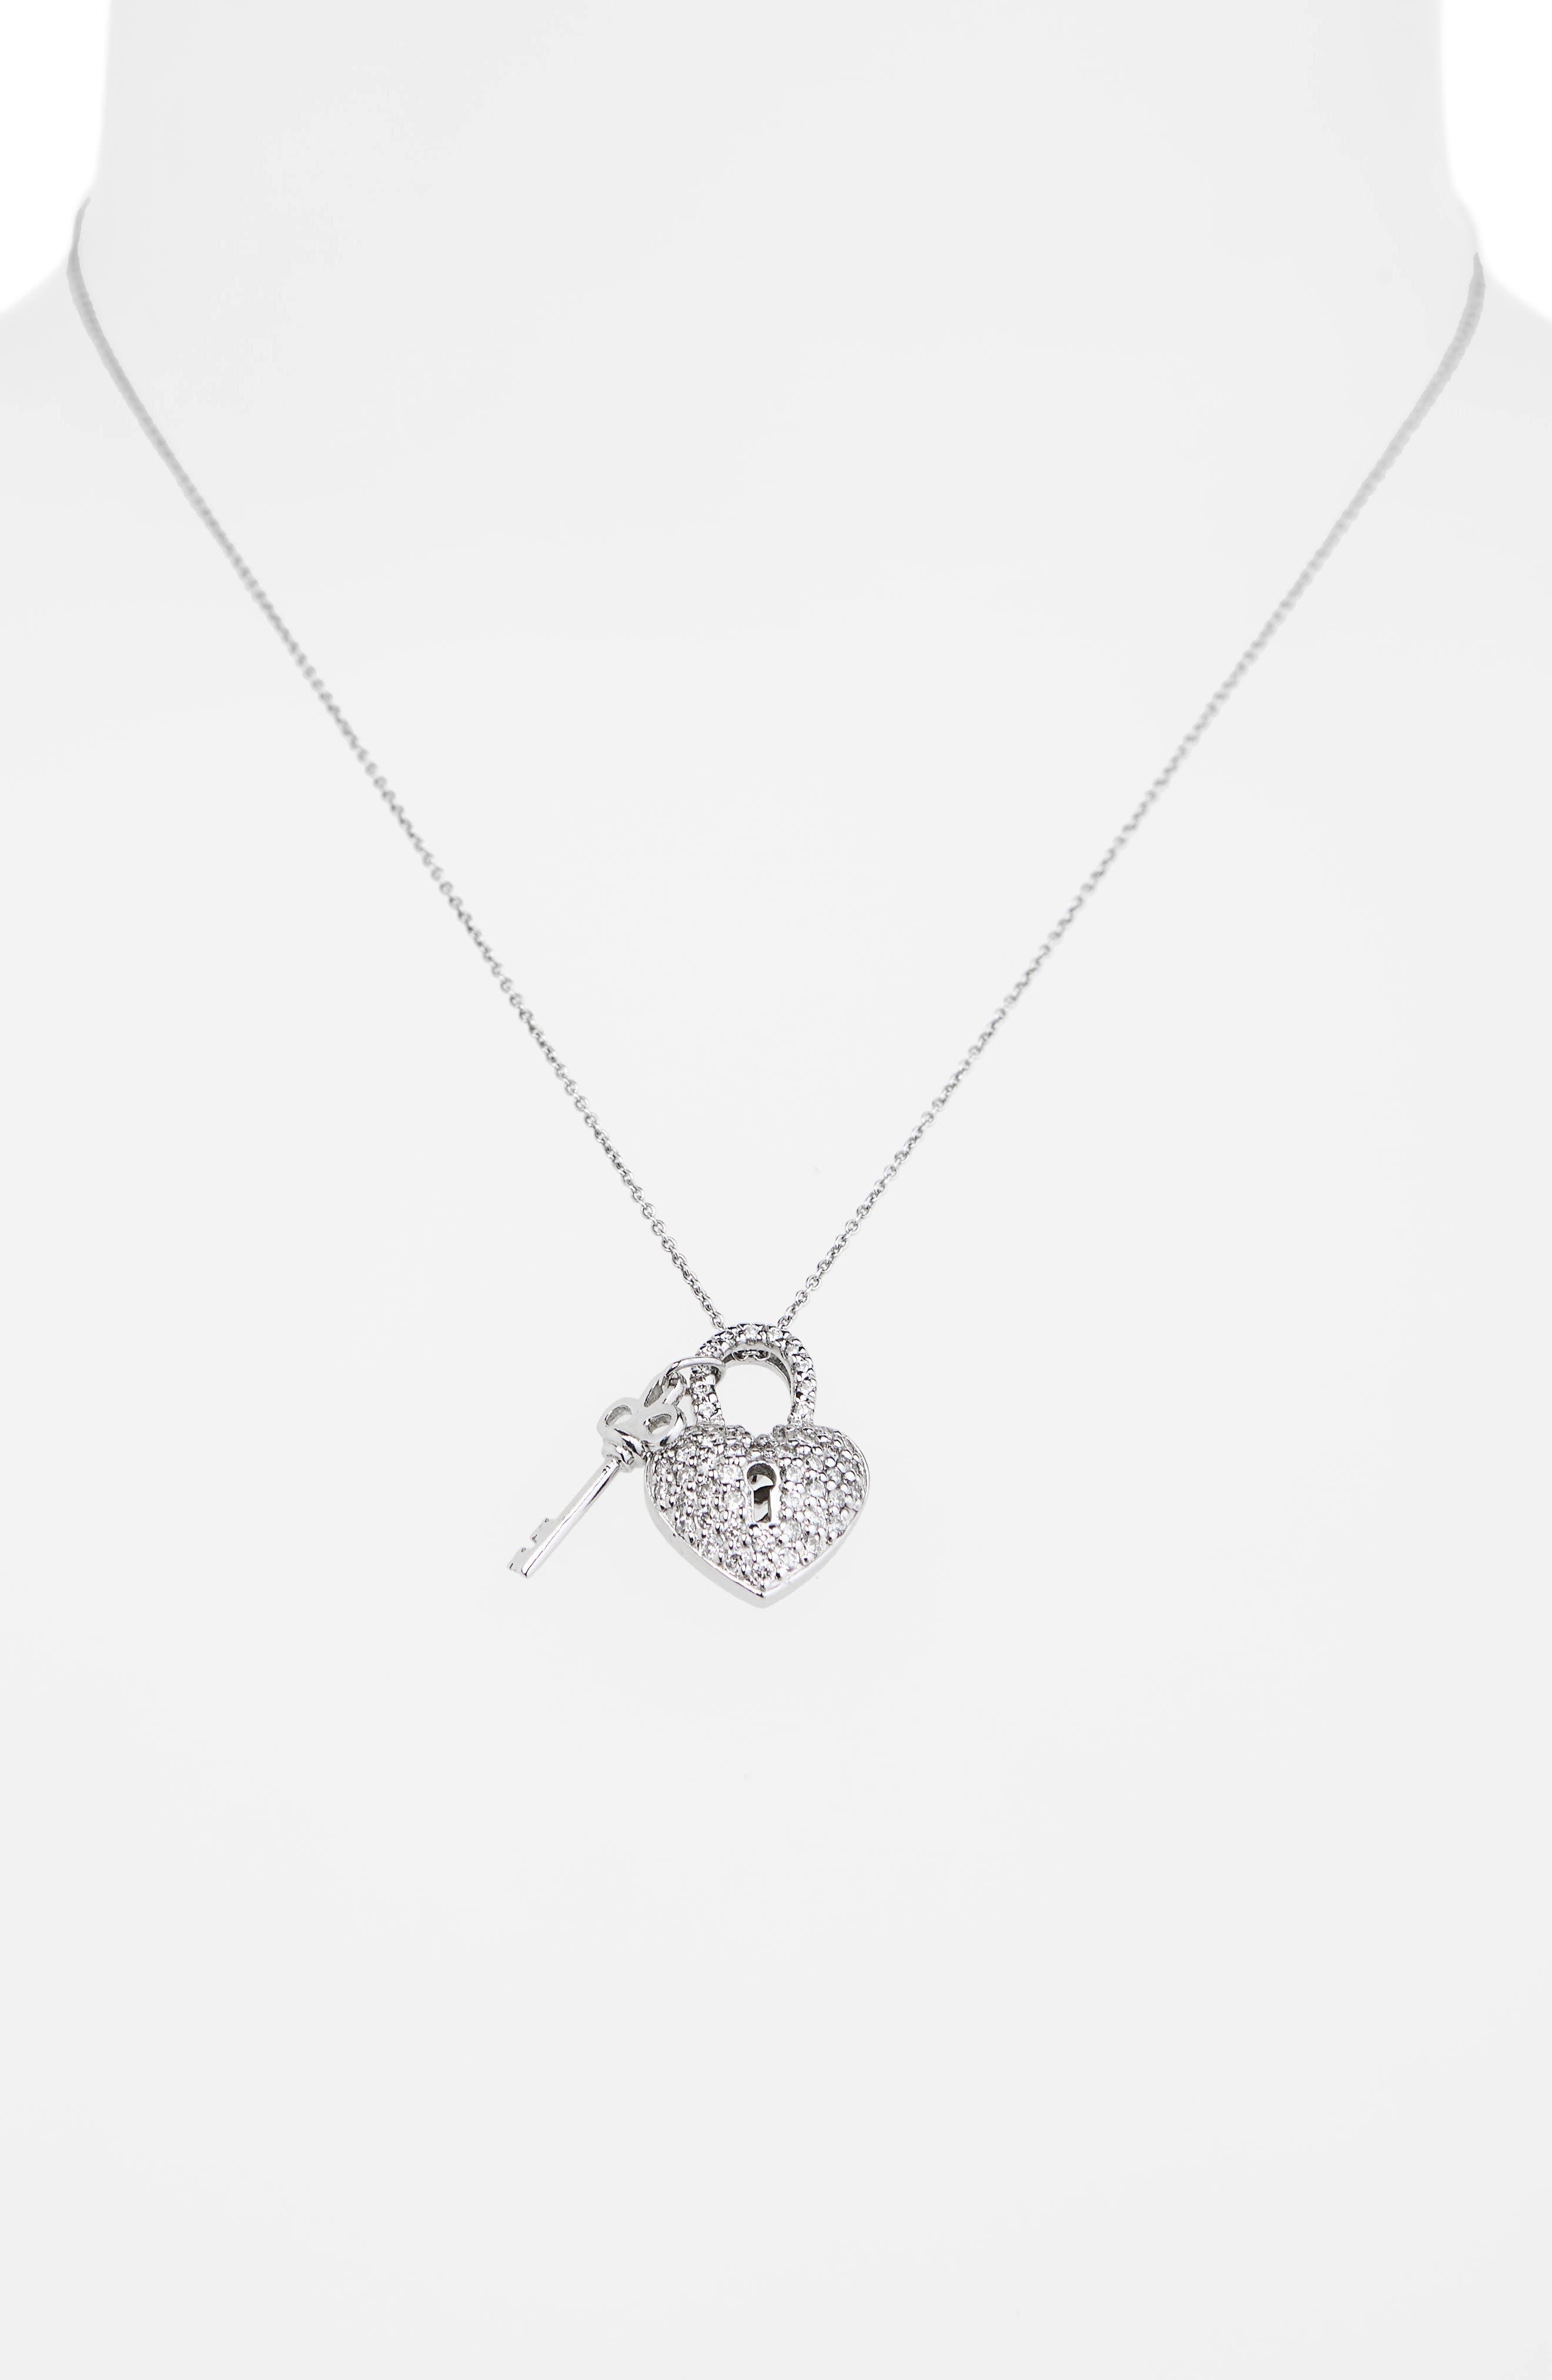 Diamond Heart Lock Pendant Necklace,                             Alternate thumbnail 2, color,                             White Gold